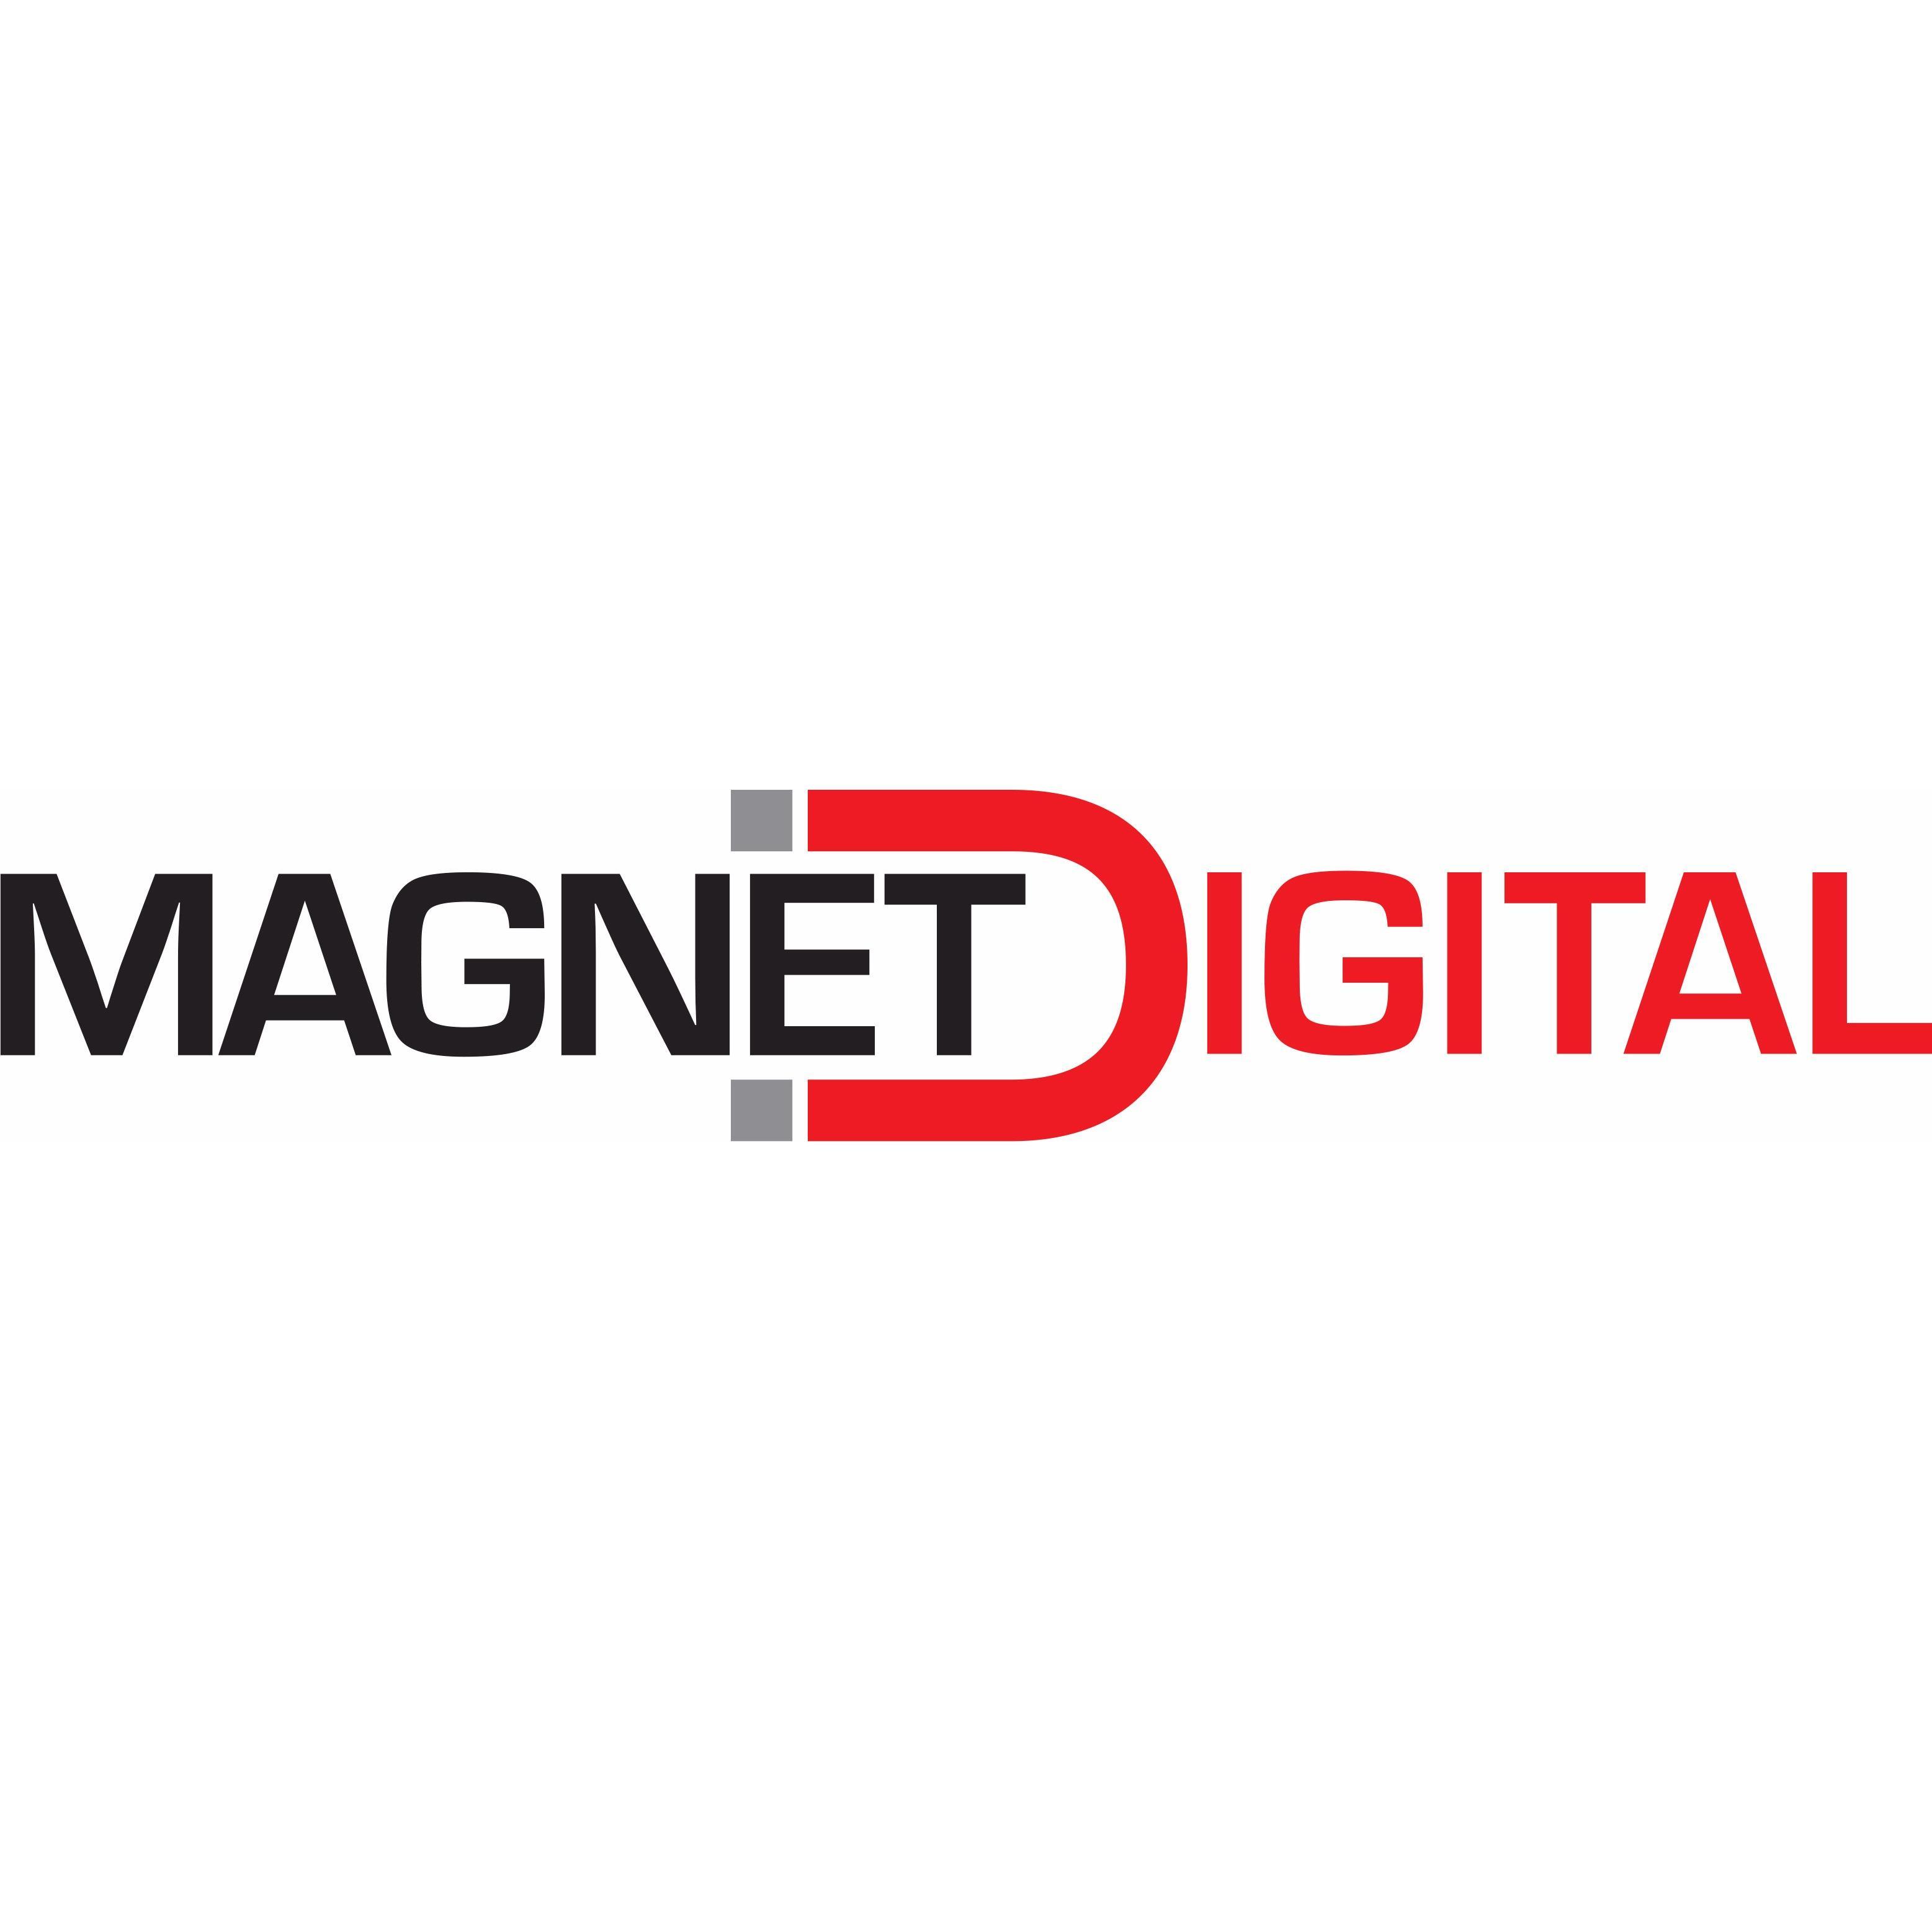 Magnet Digital Brighton Michigan Mi